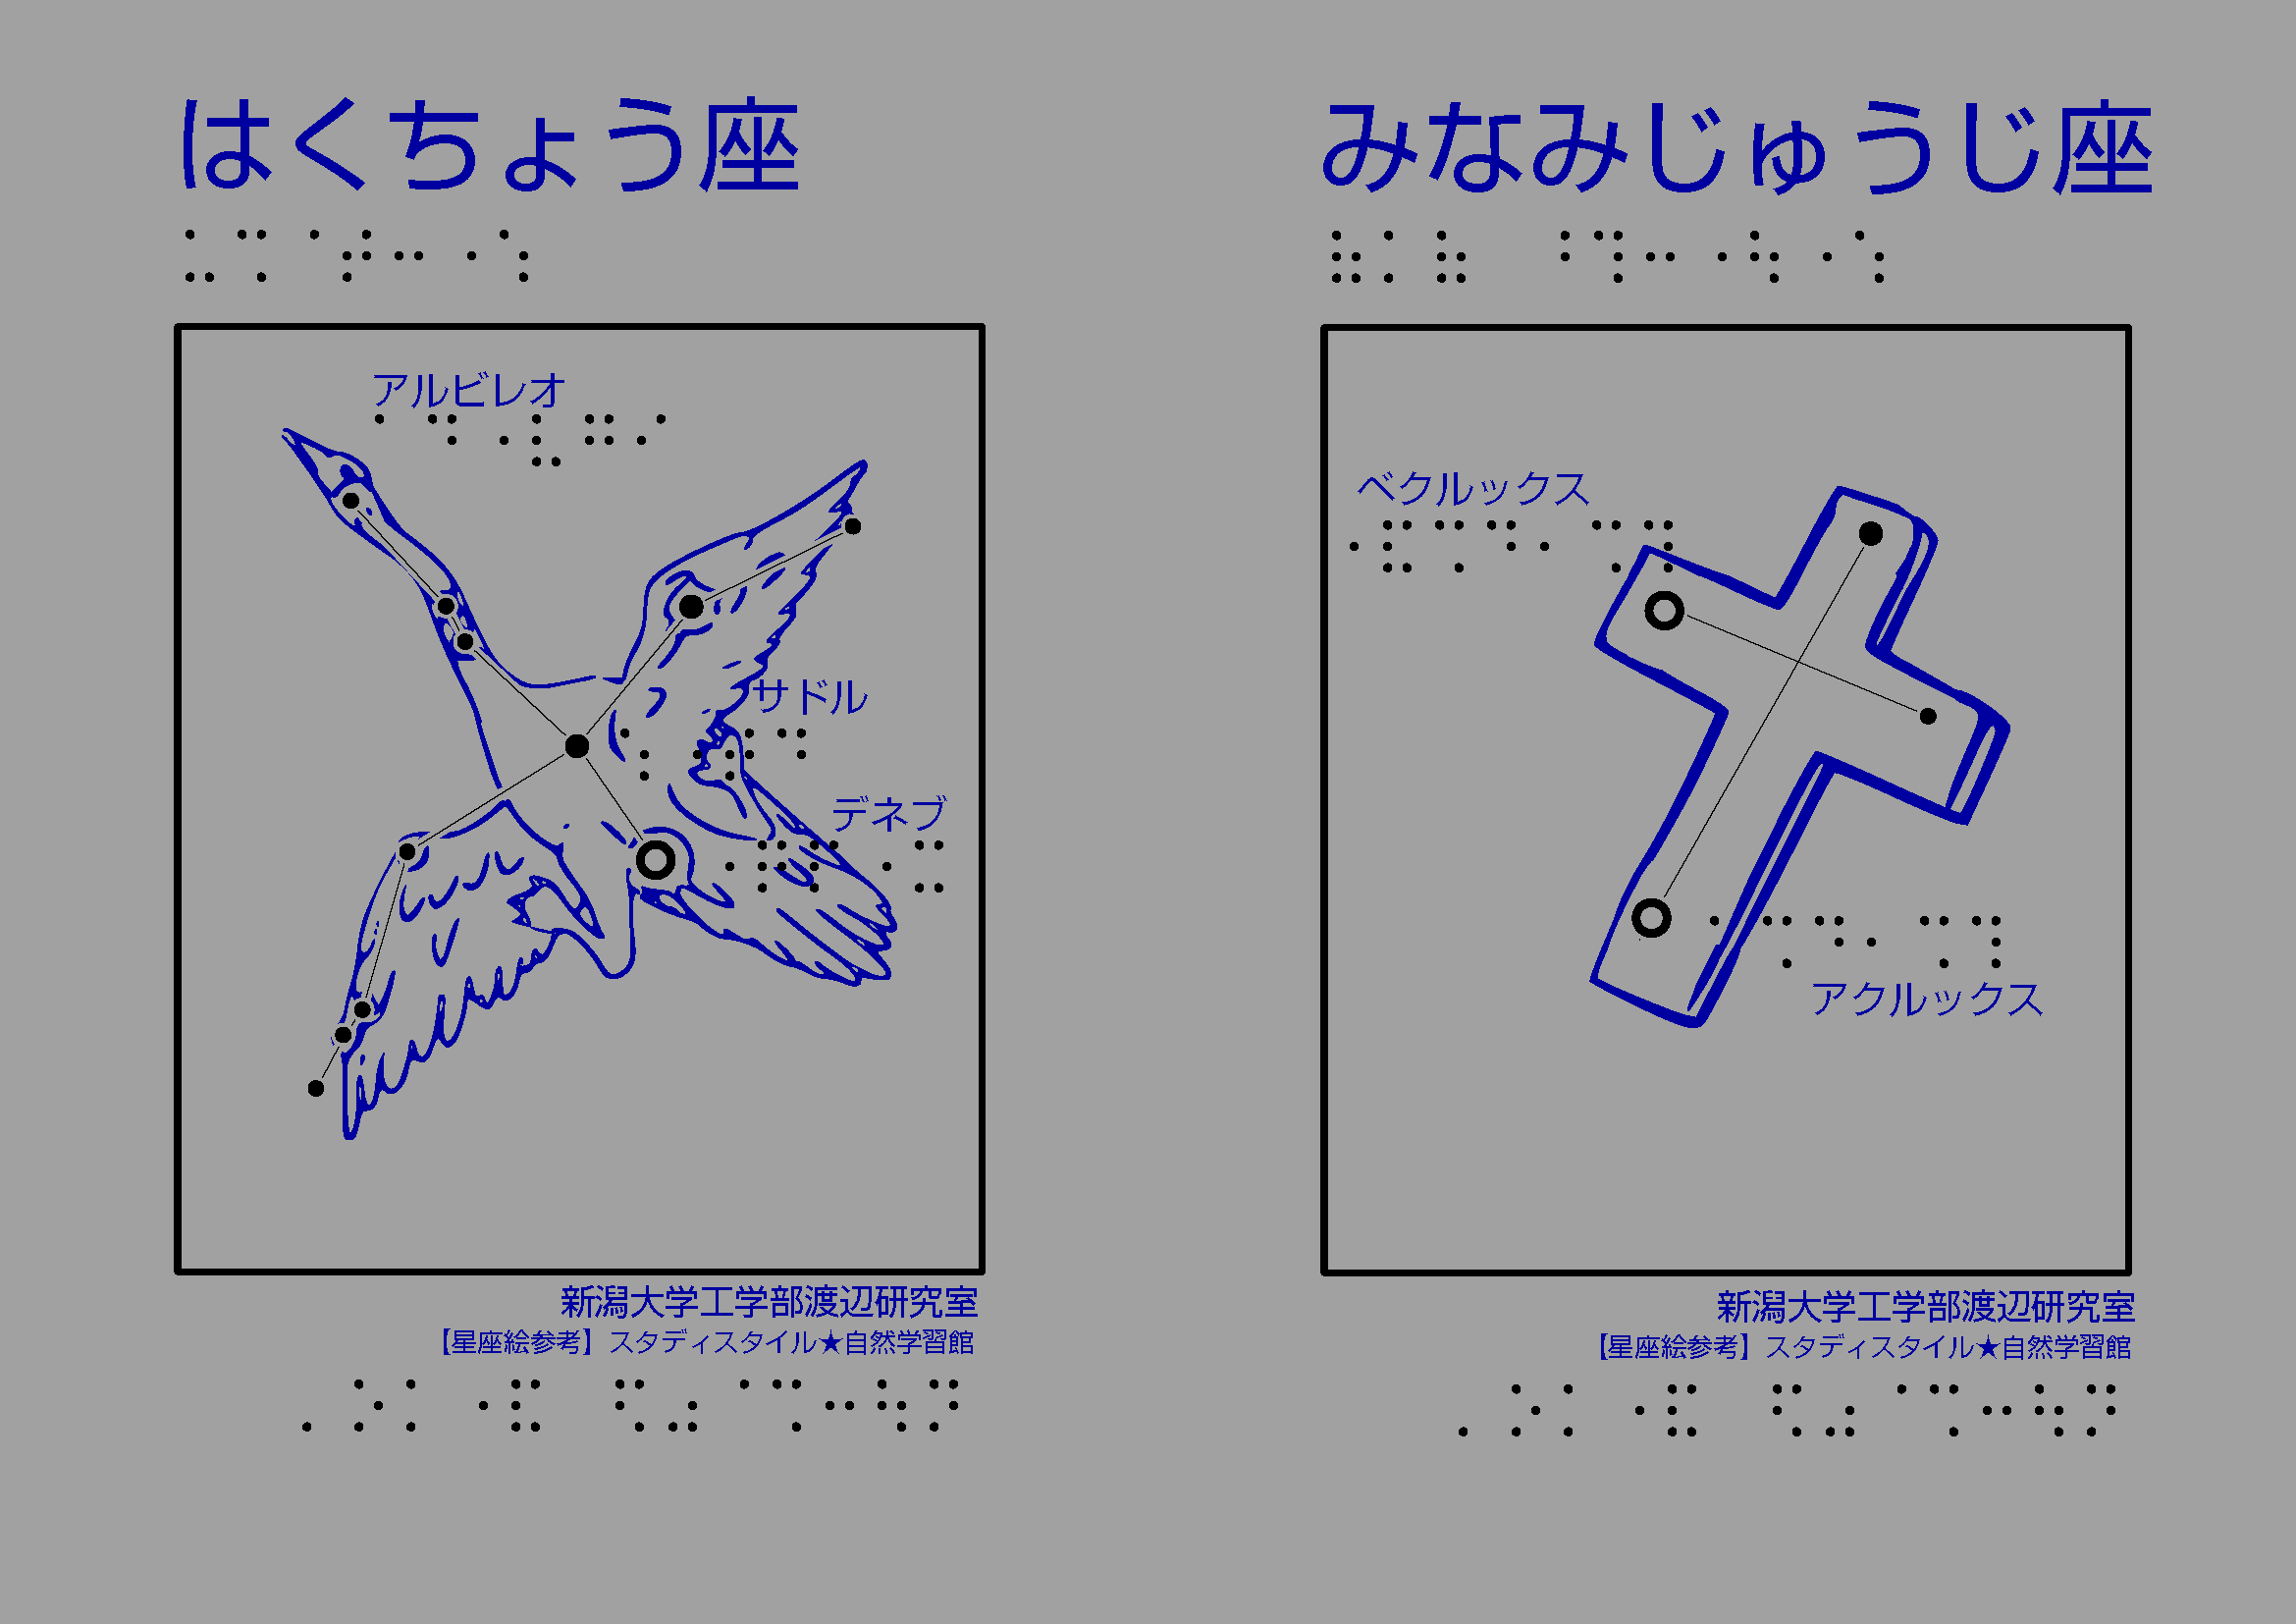 白鳥座と南十字座の星座絵